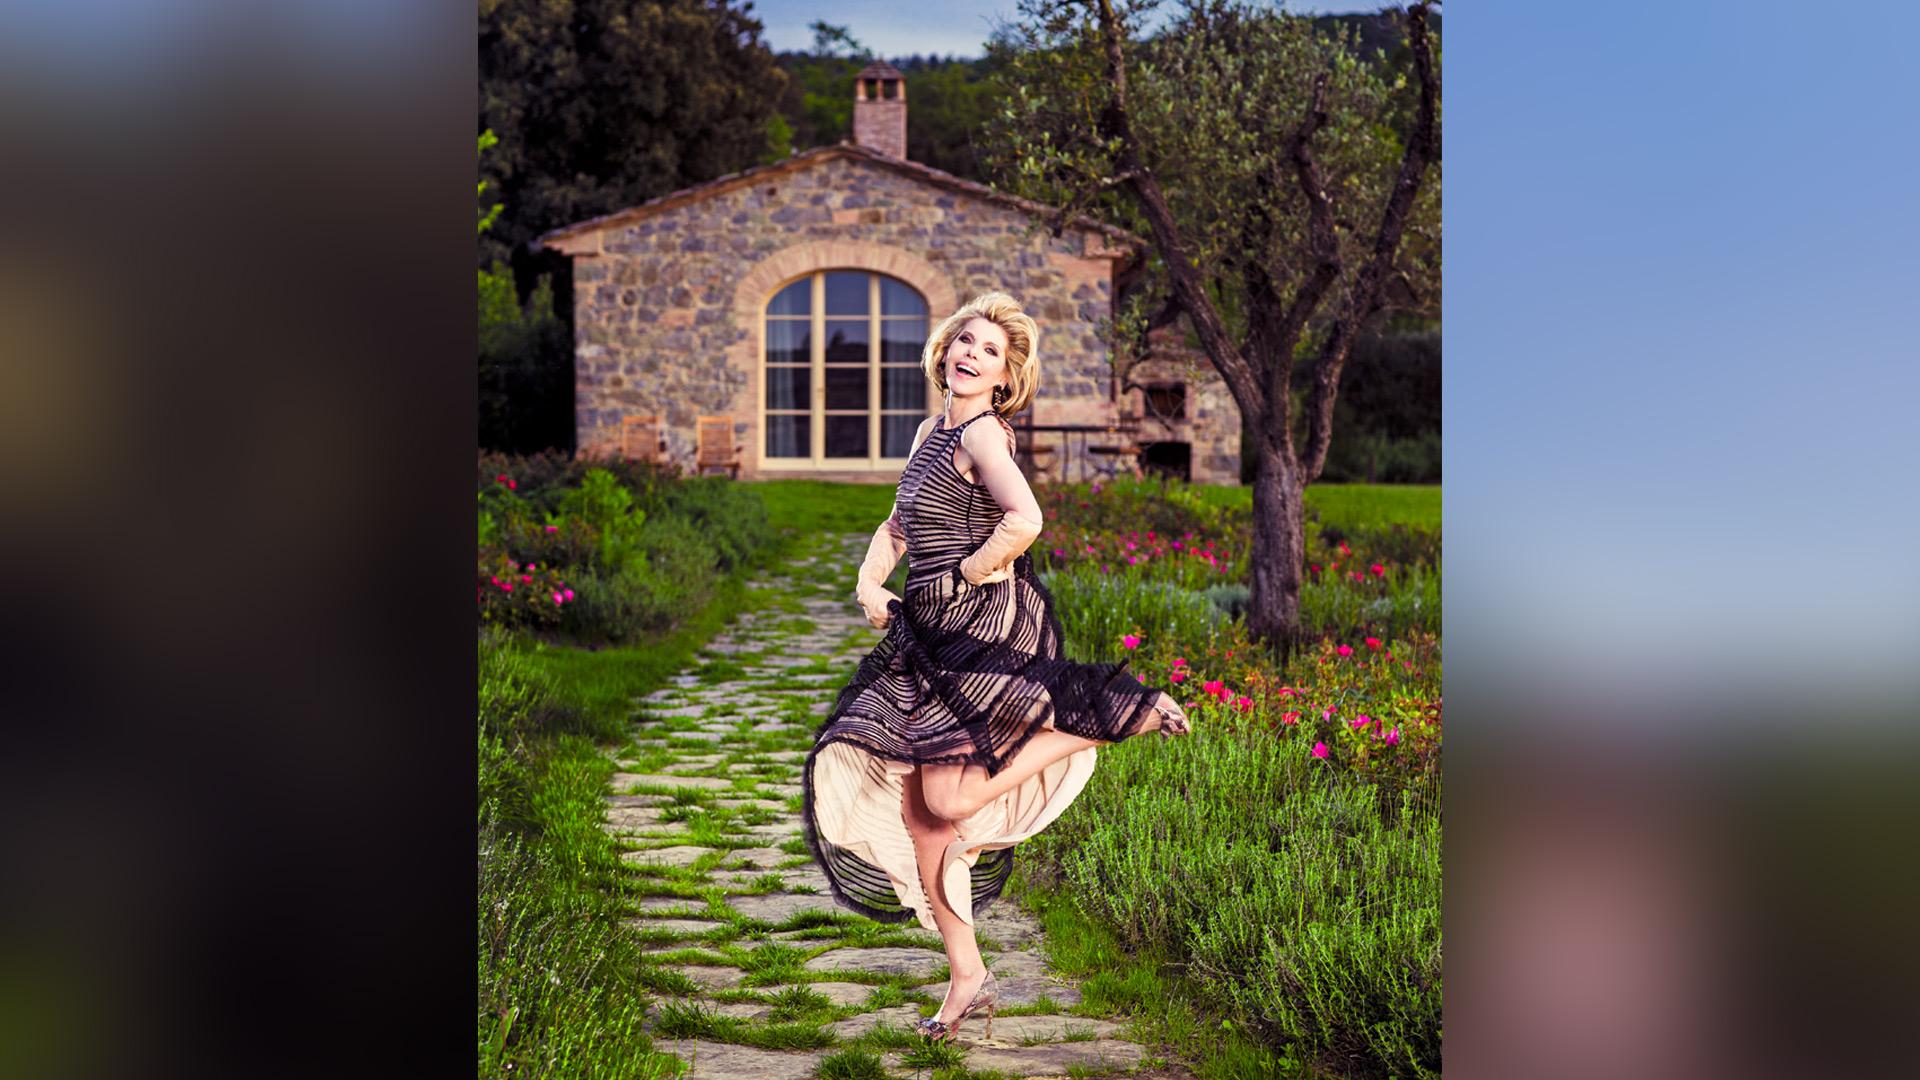 Do what Christine Baranski does. Dance like no one's watching!